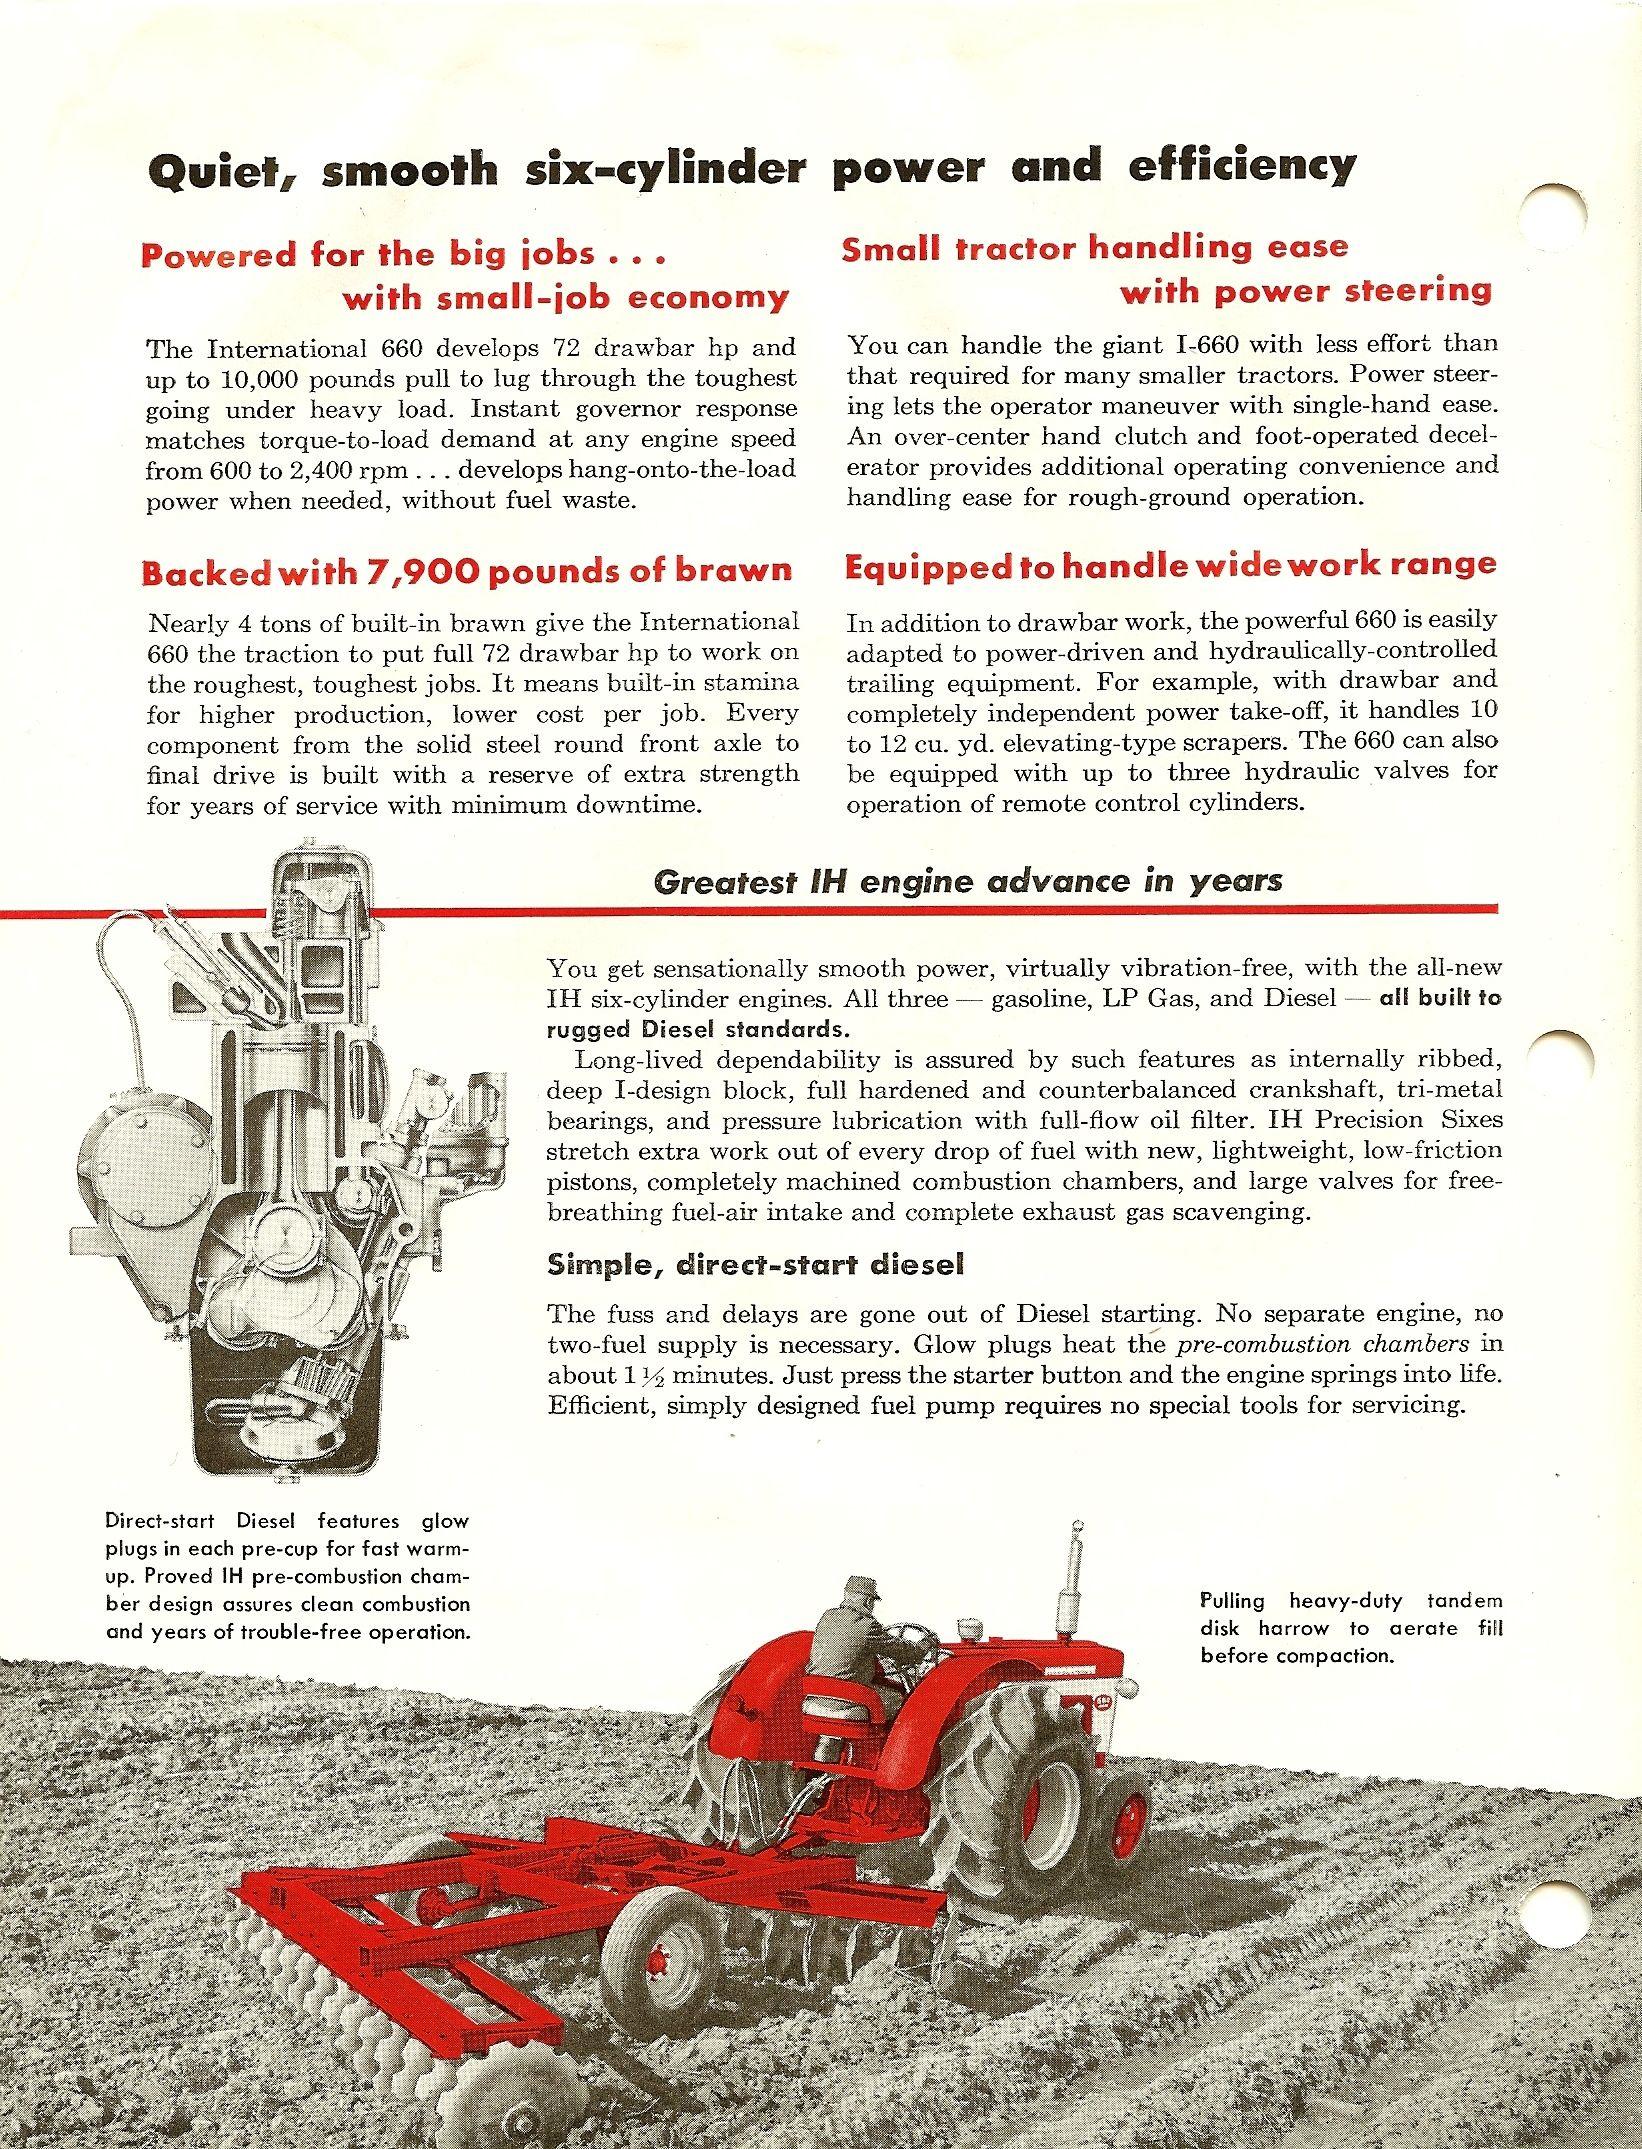 1960 IH 660 Tractor  | International Harvester Advertising